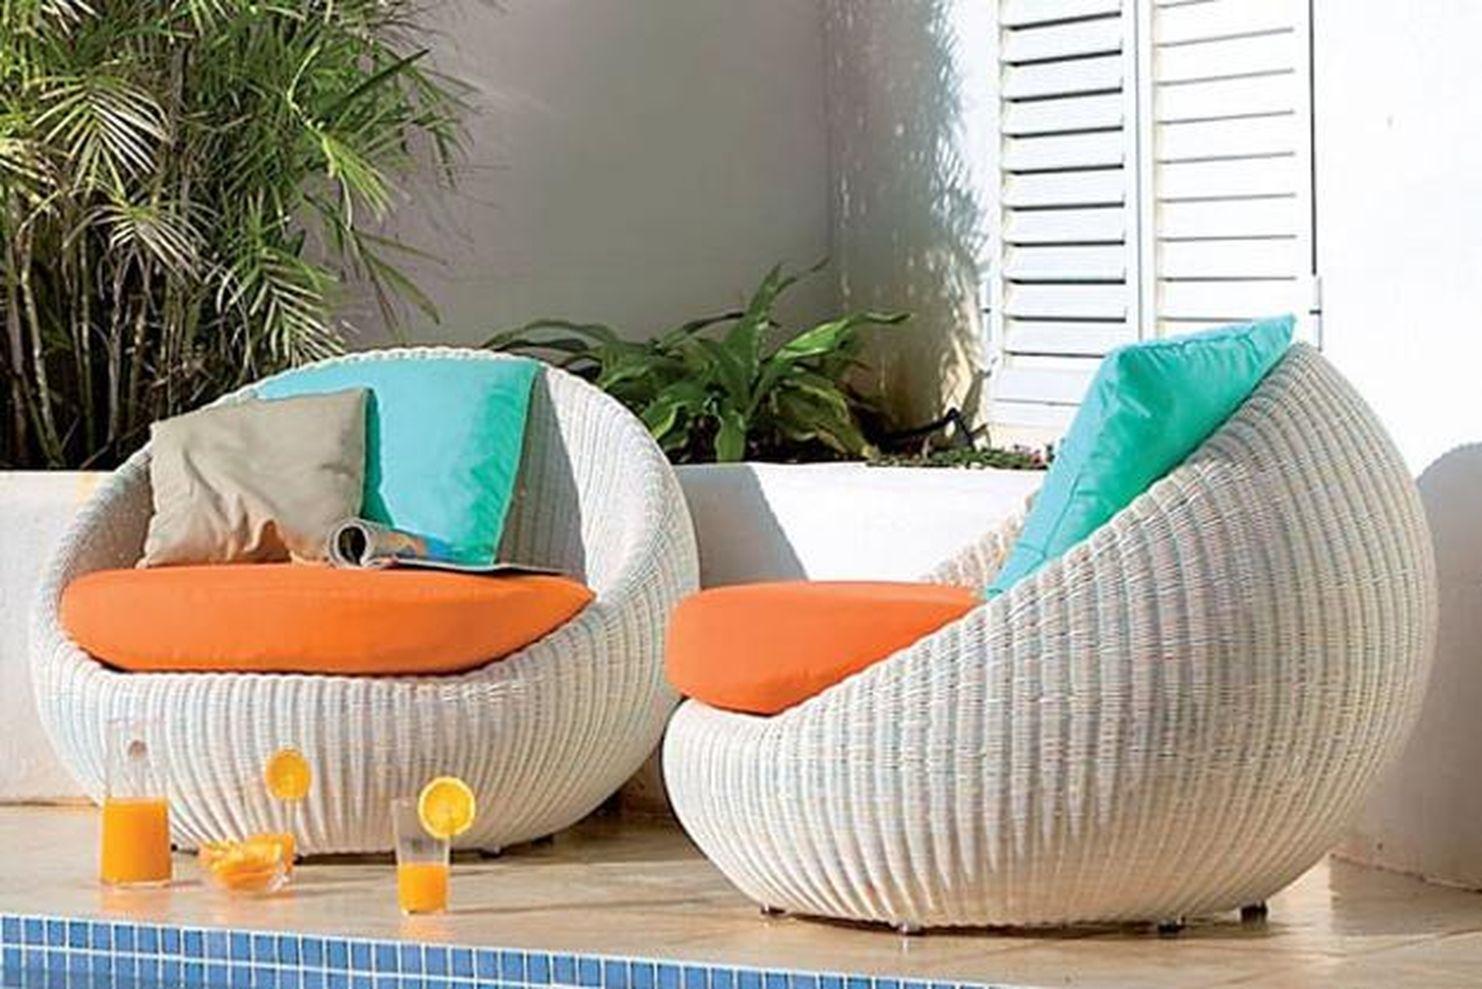 pin by seragidecor on furniture ideas in 2019